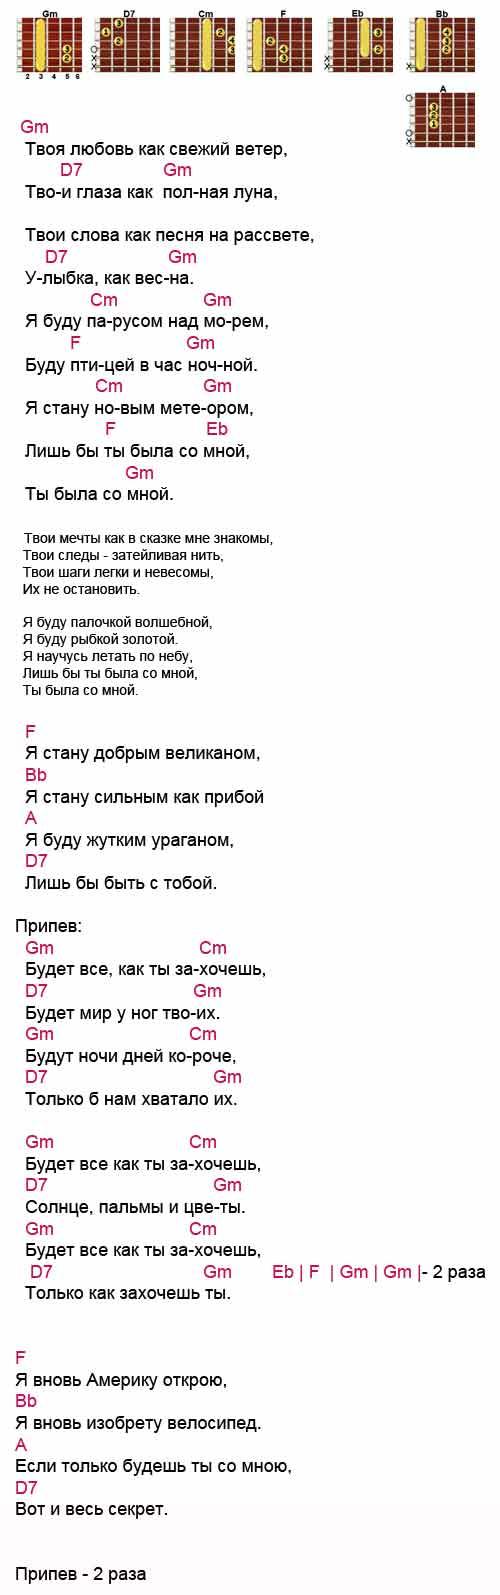 Аккорды к песне «Будет все как ты захочешь»Александр Шевченко